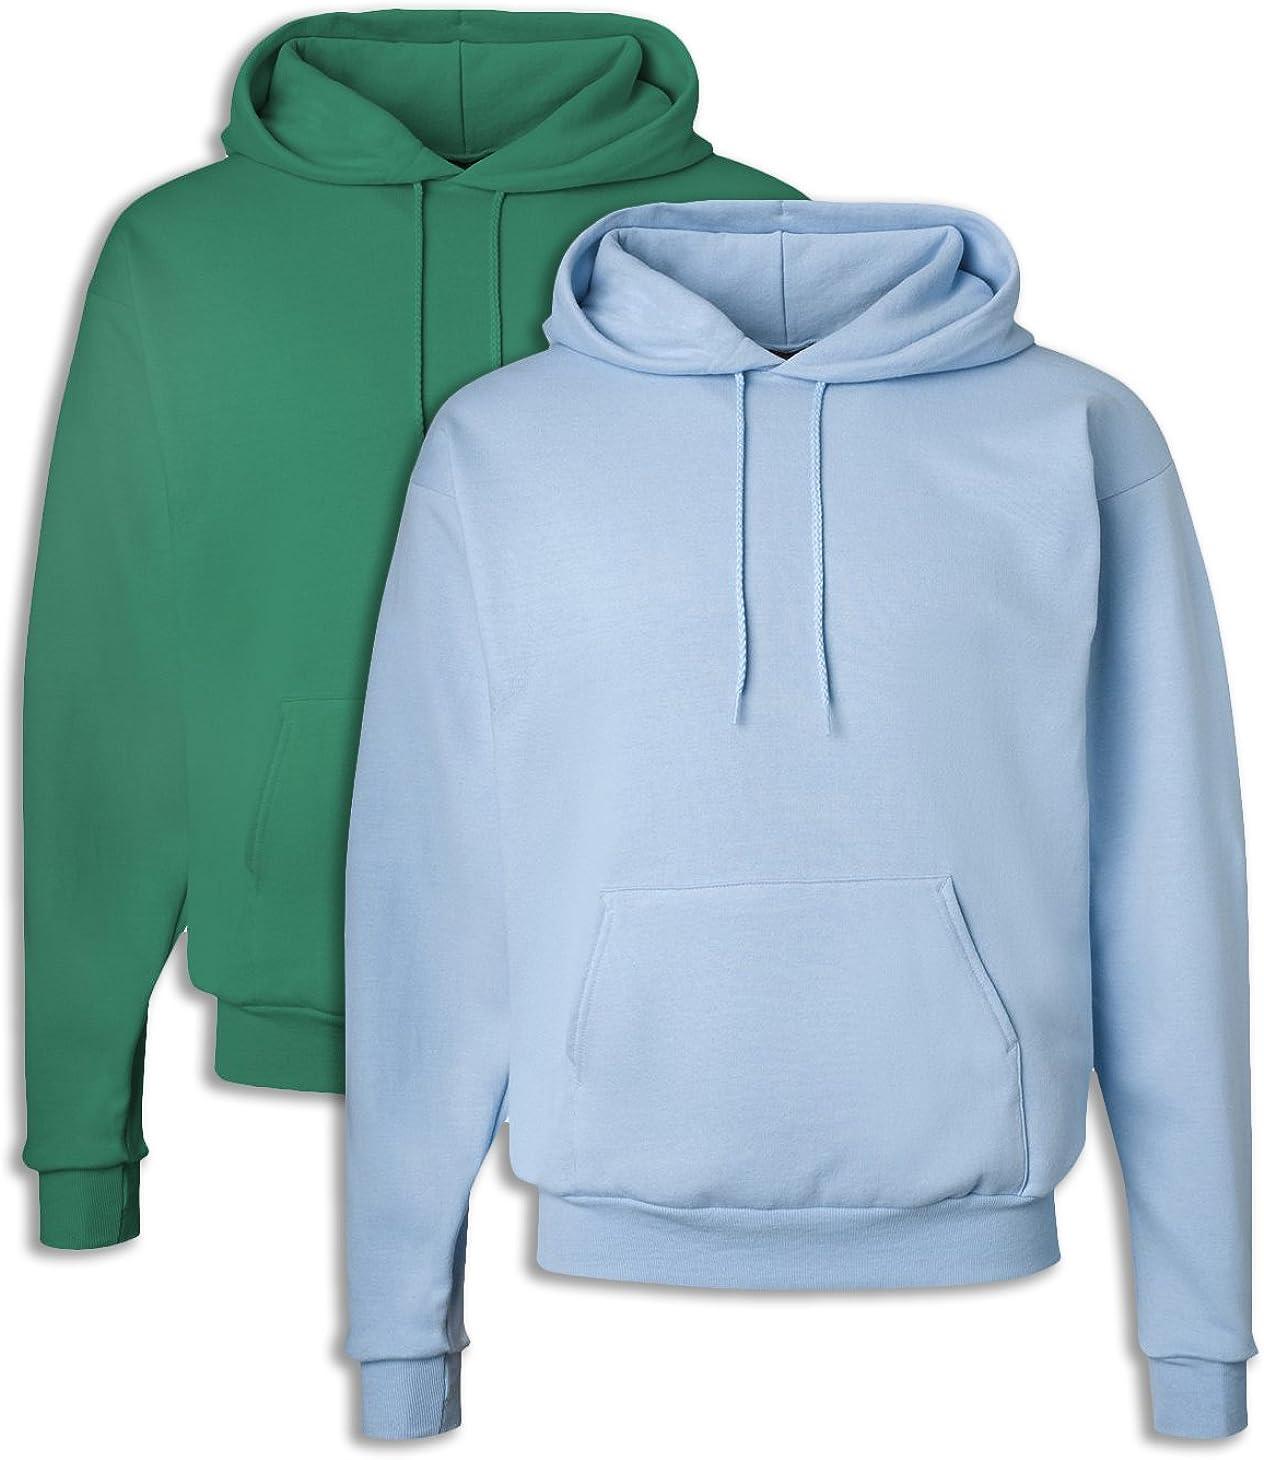 1 Purple Hanes P170 Mens EcoSmart Hooded Sweatshirt Large 1 Light Blue